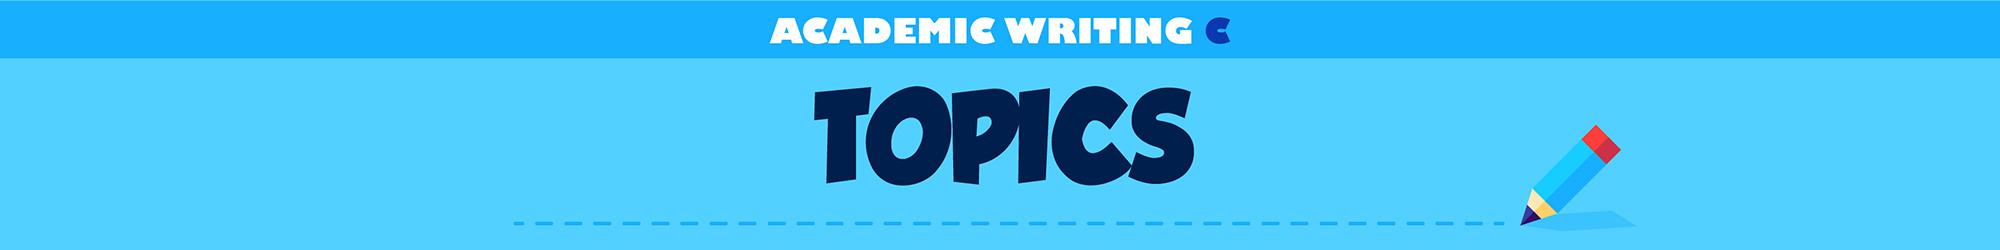 Academic Writing C (Topics) banner